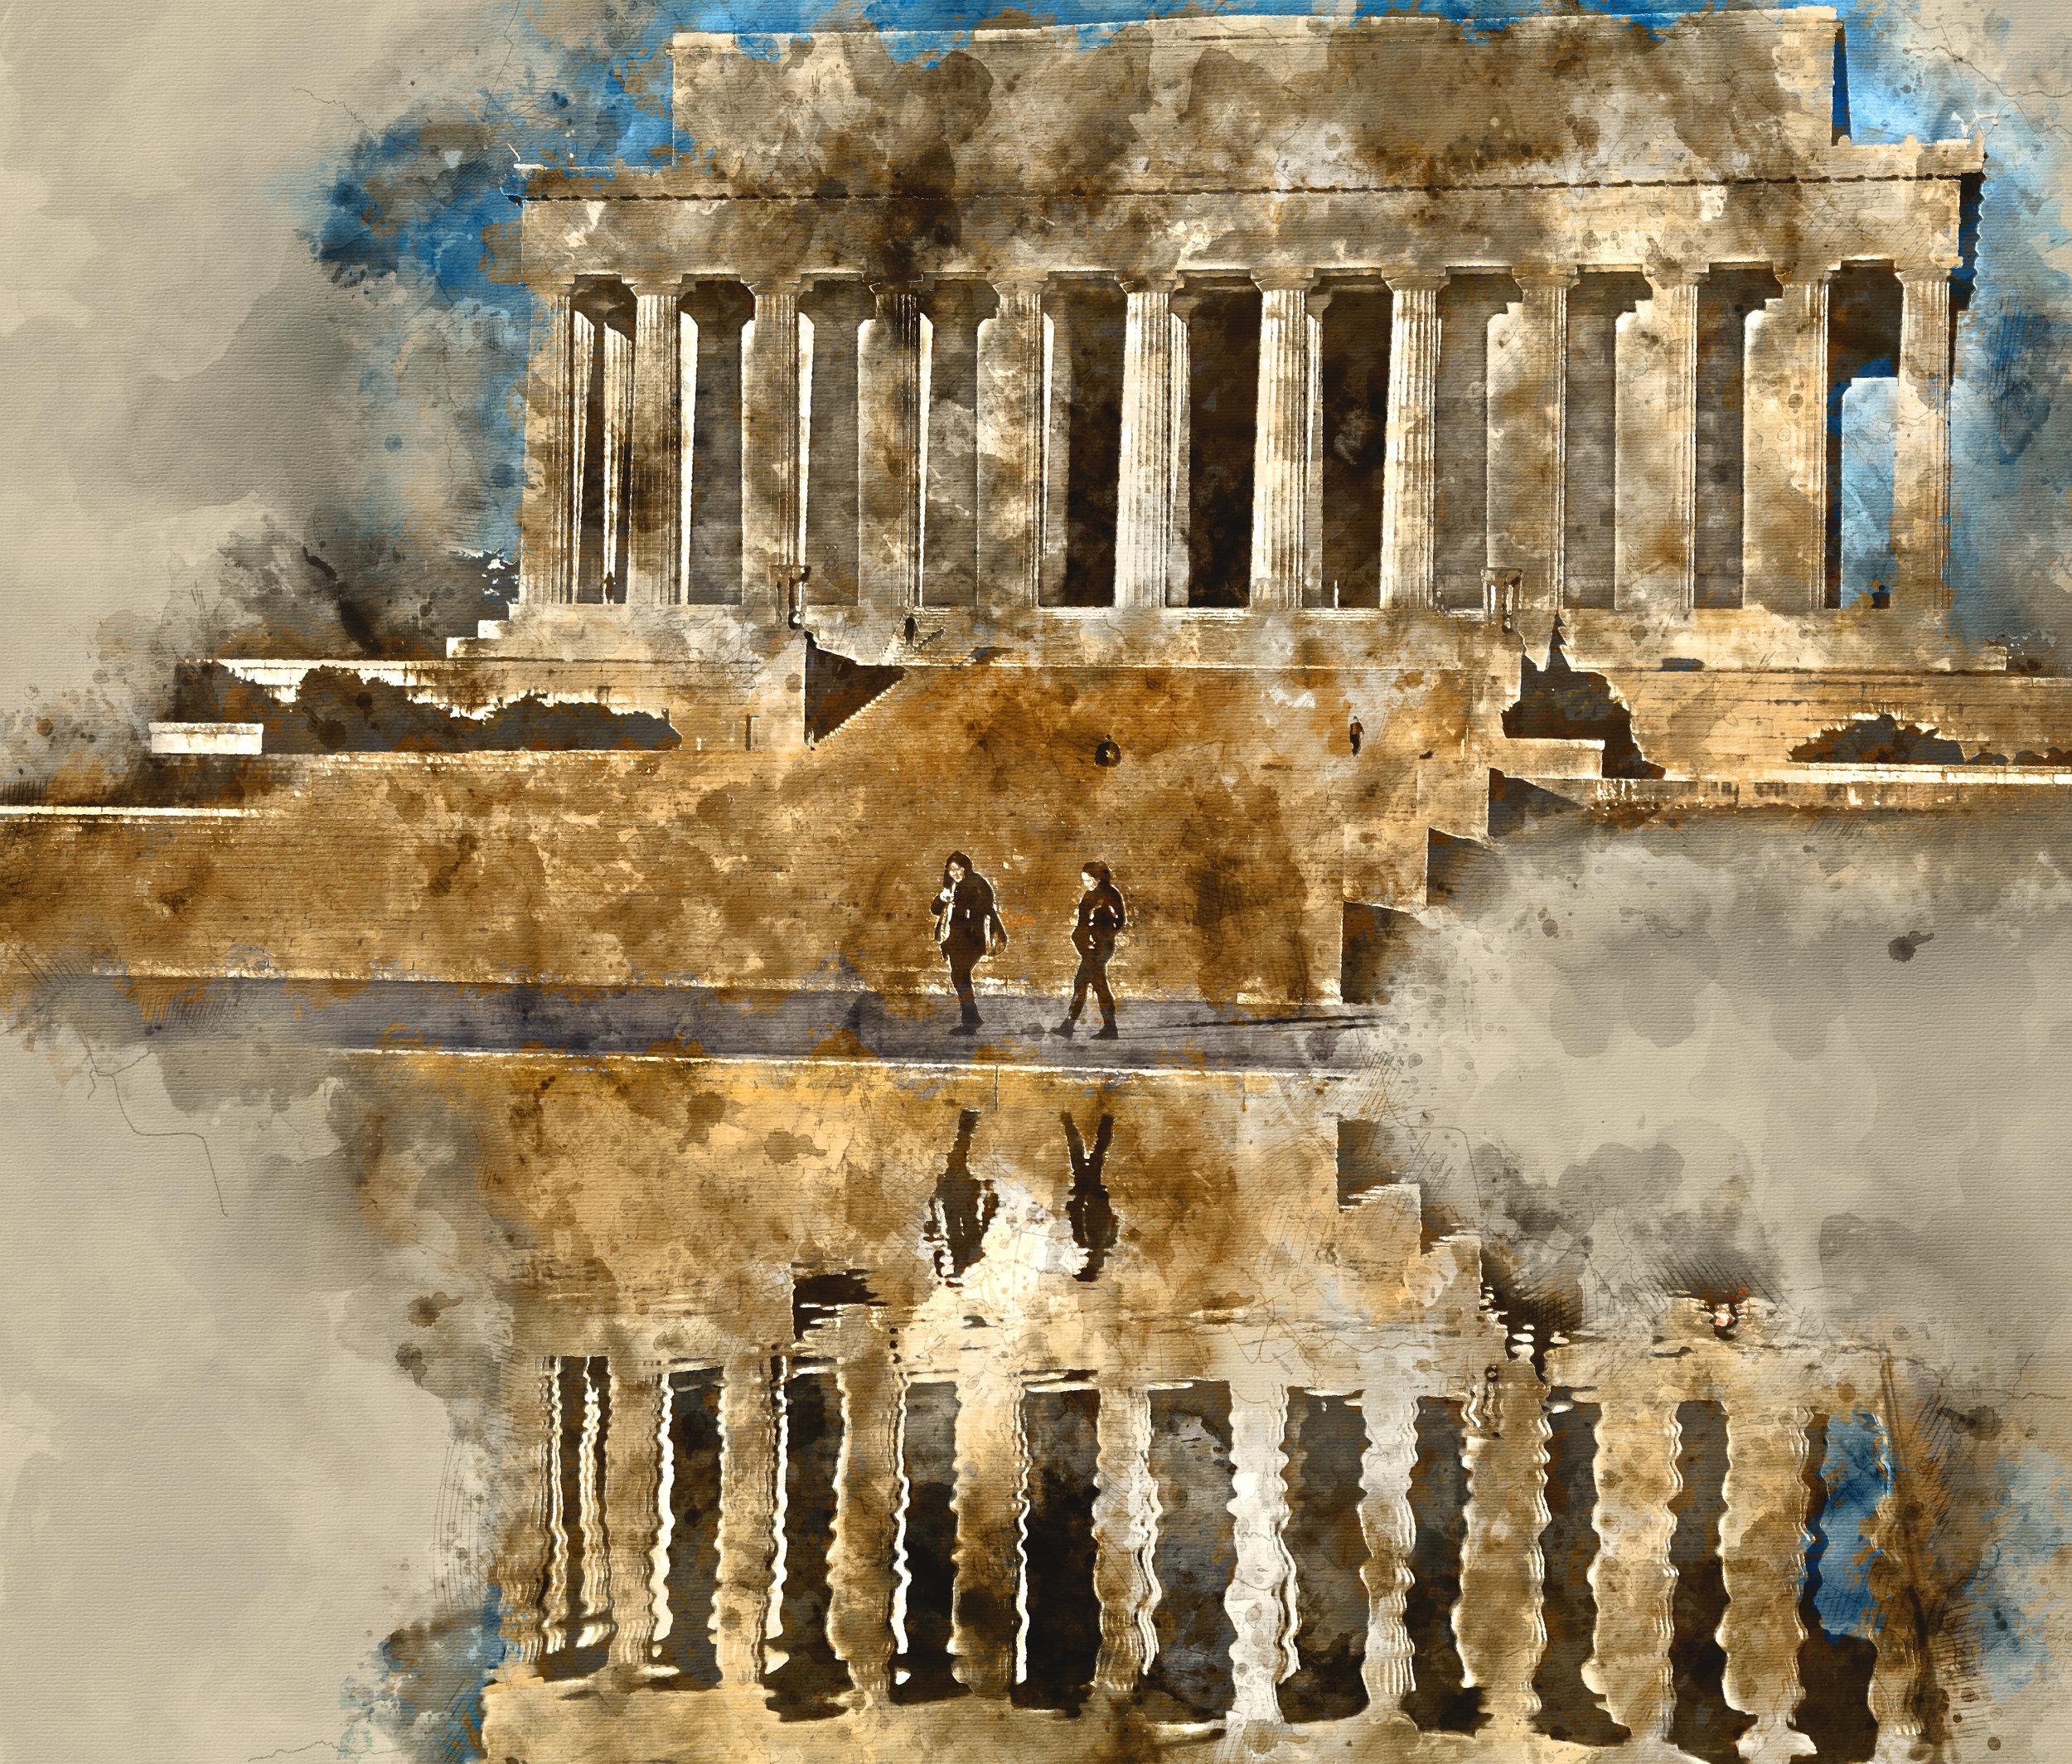 Lincoln Memorial - Mixed Media/Watercolor